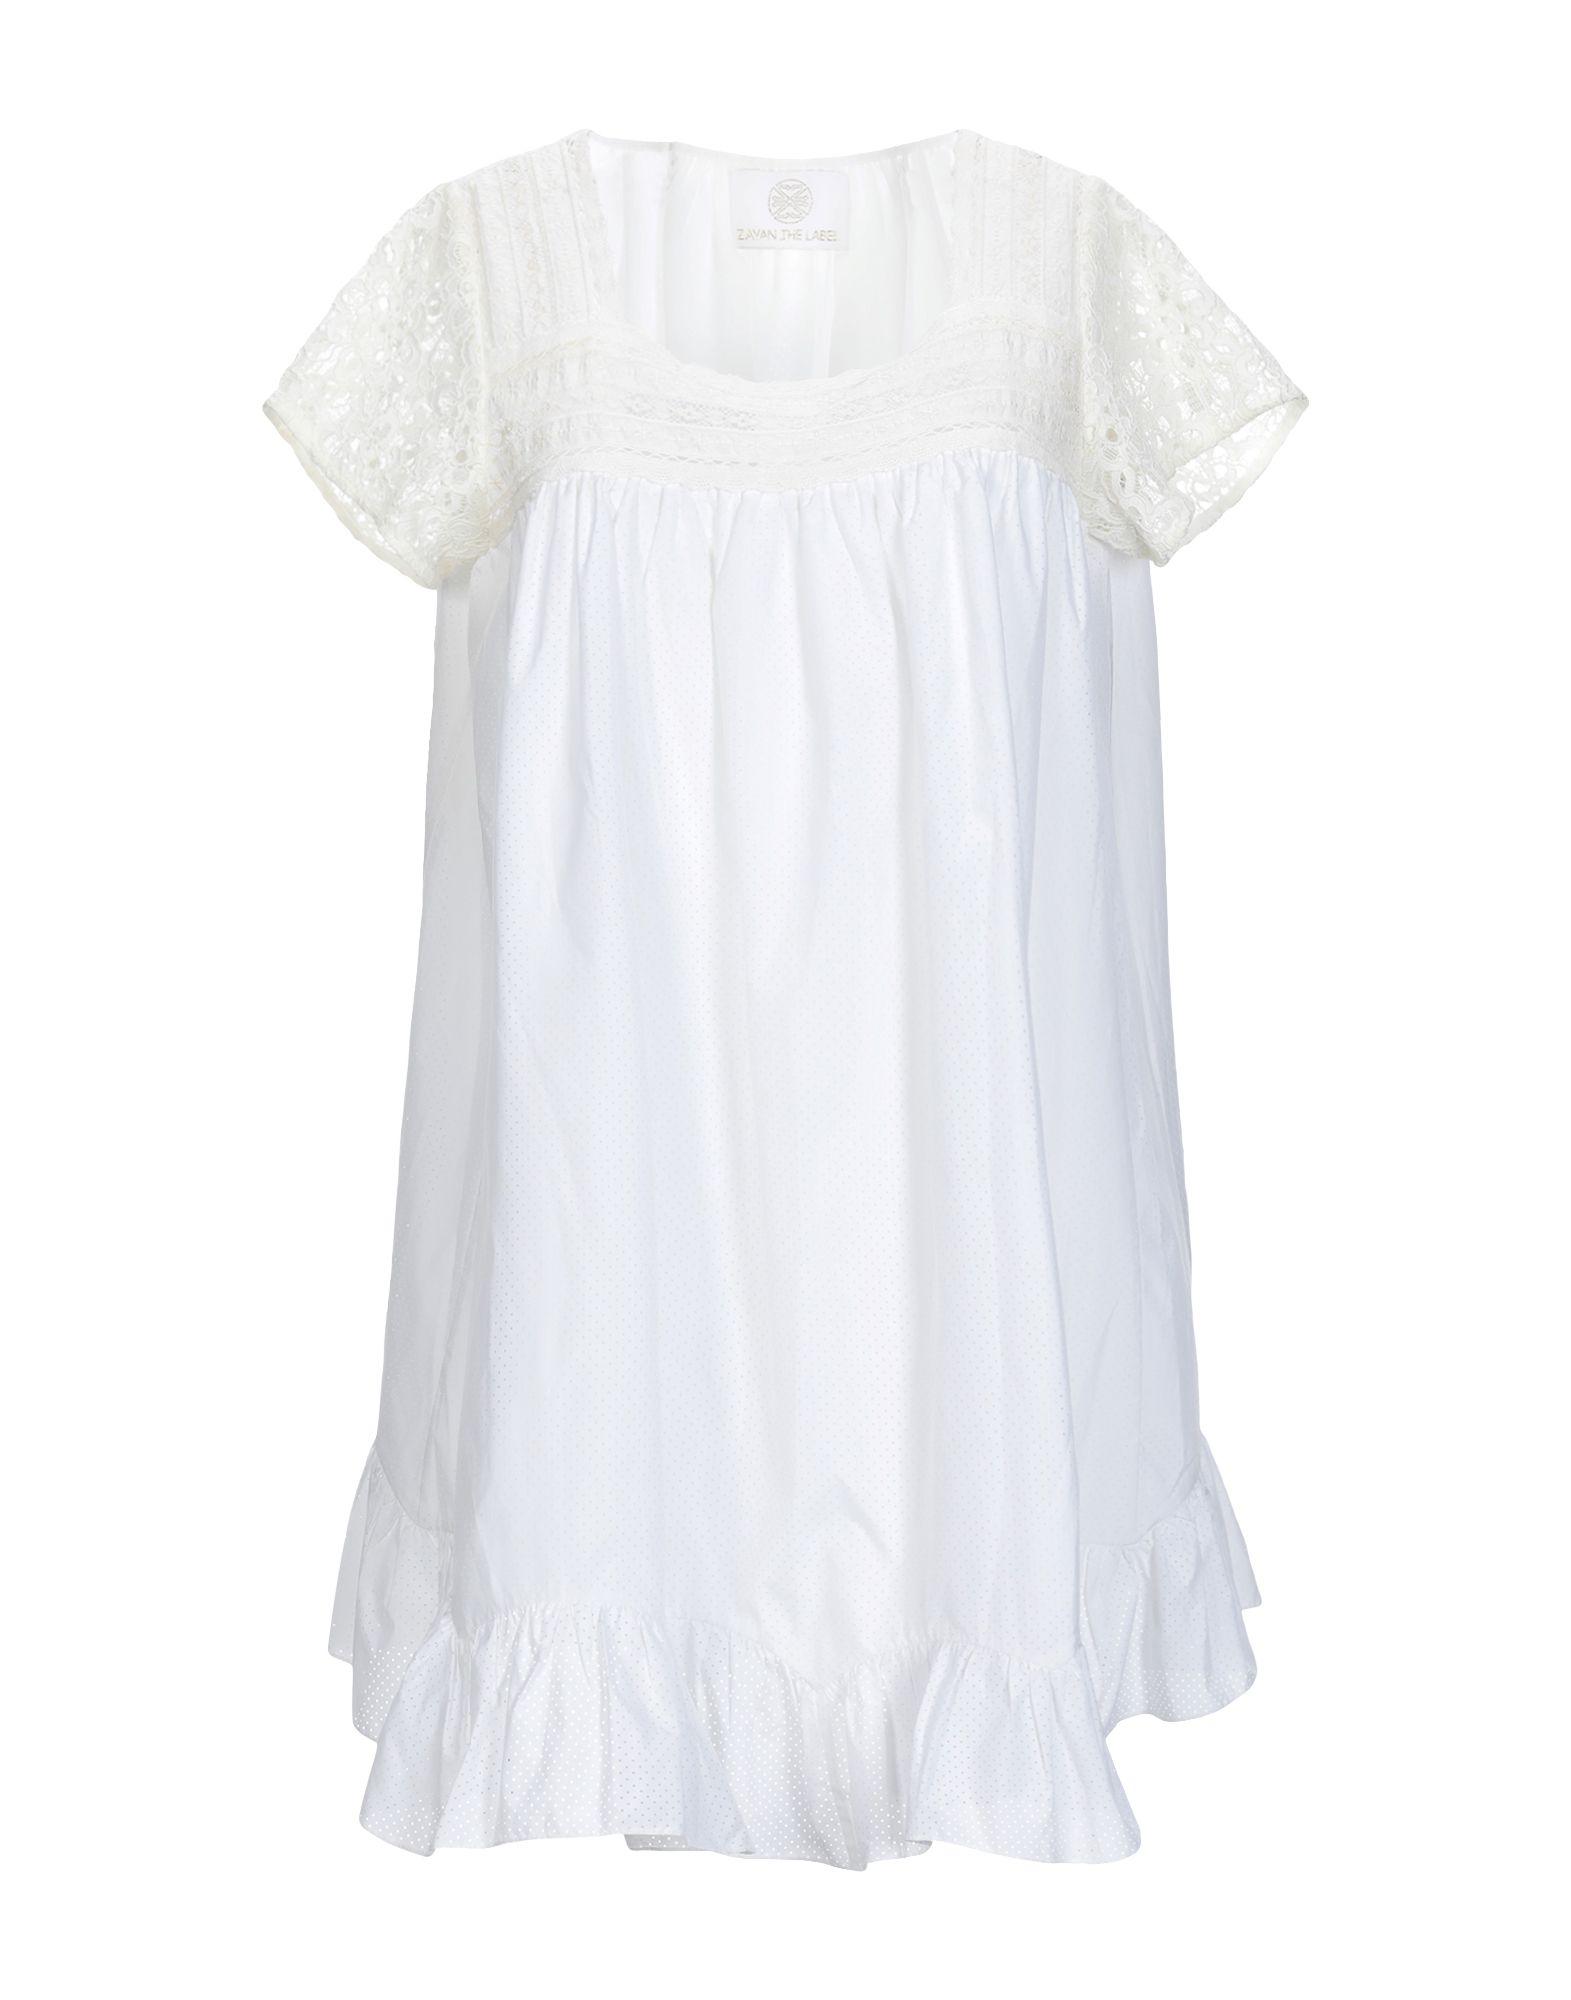 ZAYAN THE LABEL Короткое платье zayan the label платье до колена